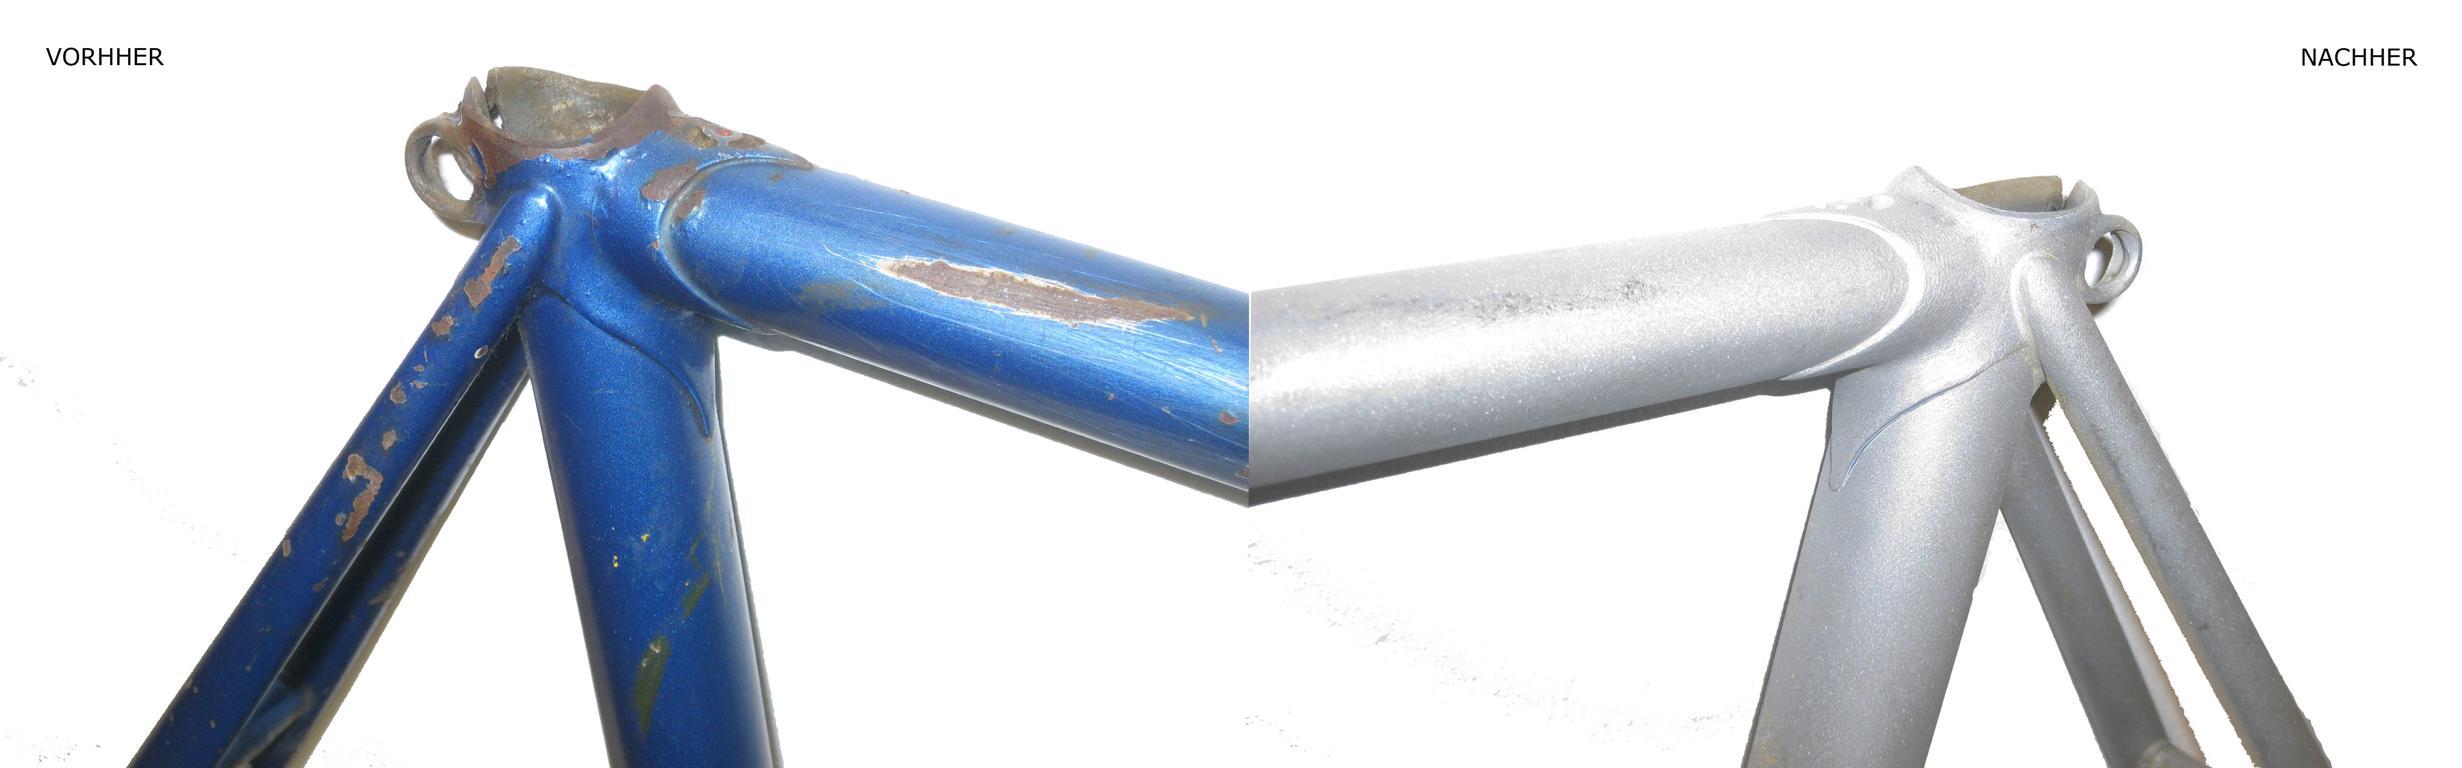 Sexszene aus blauem Stahl